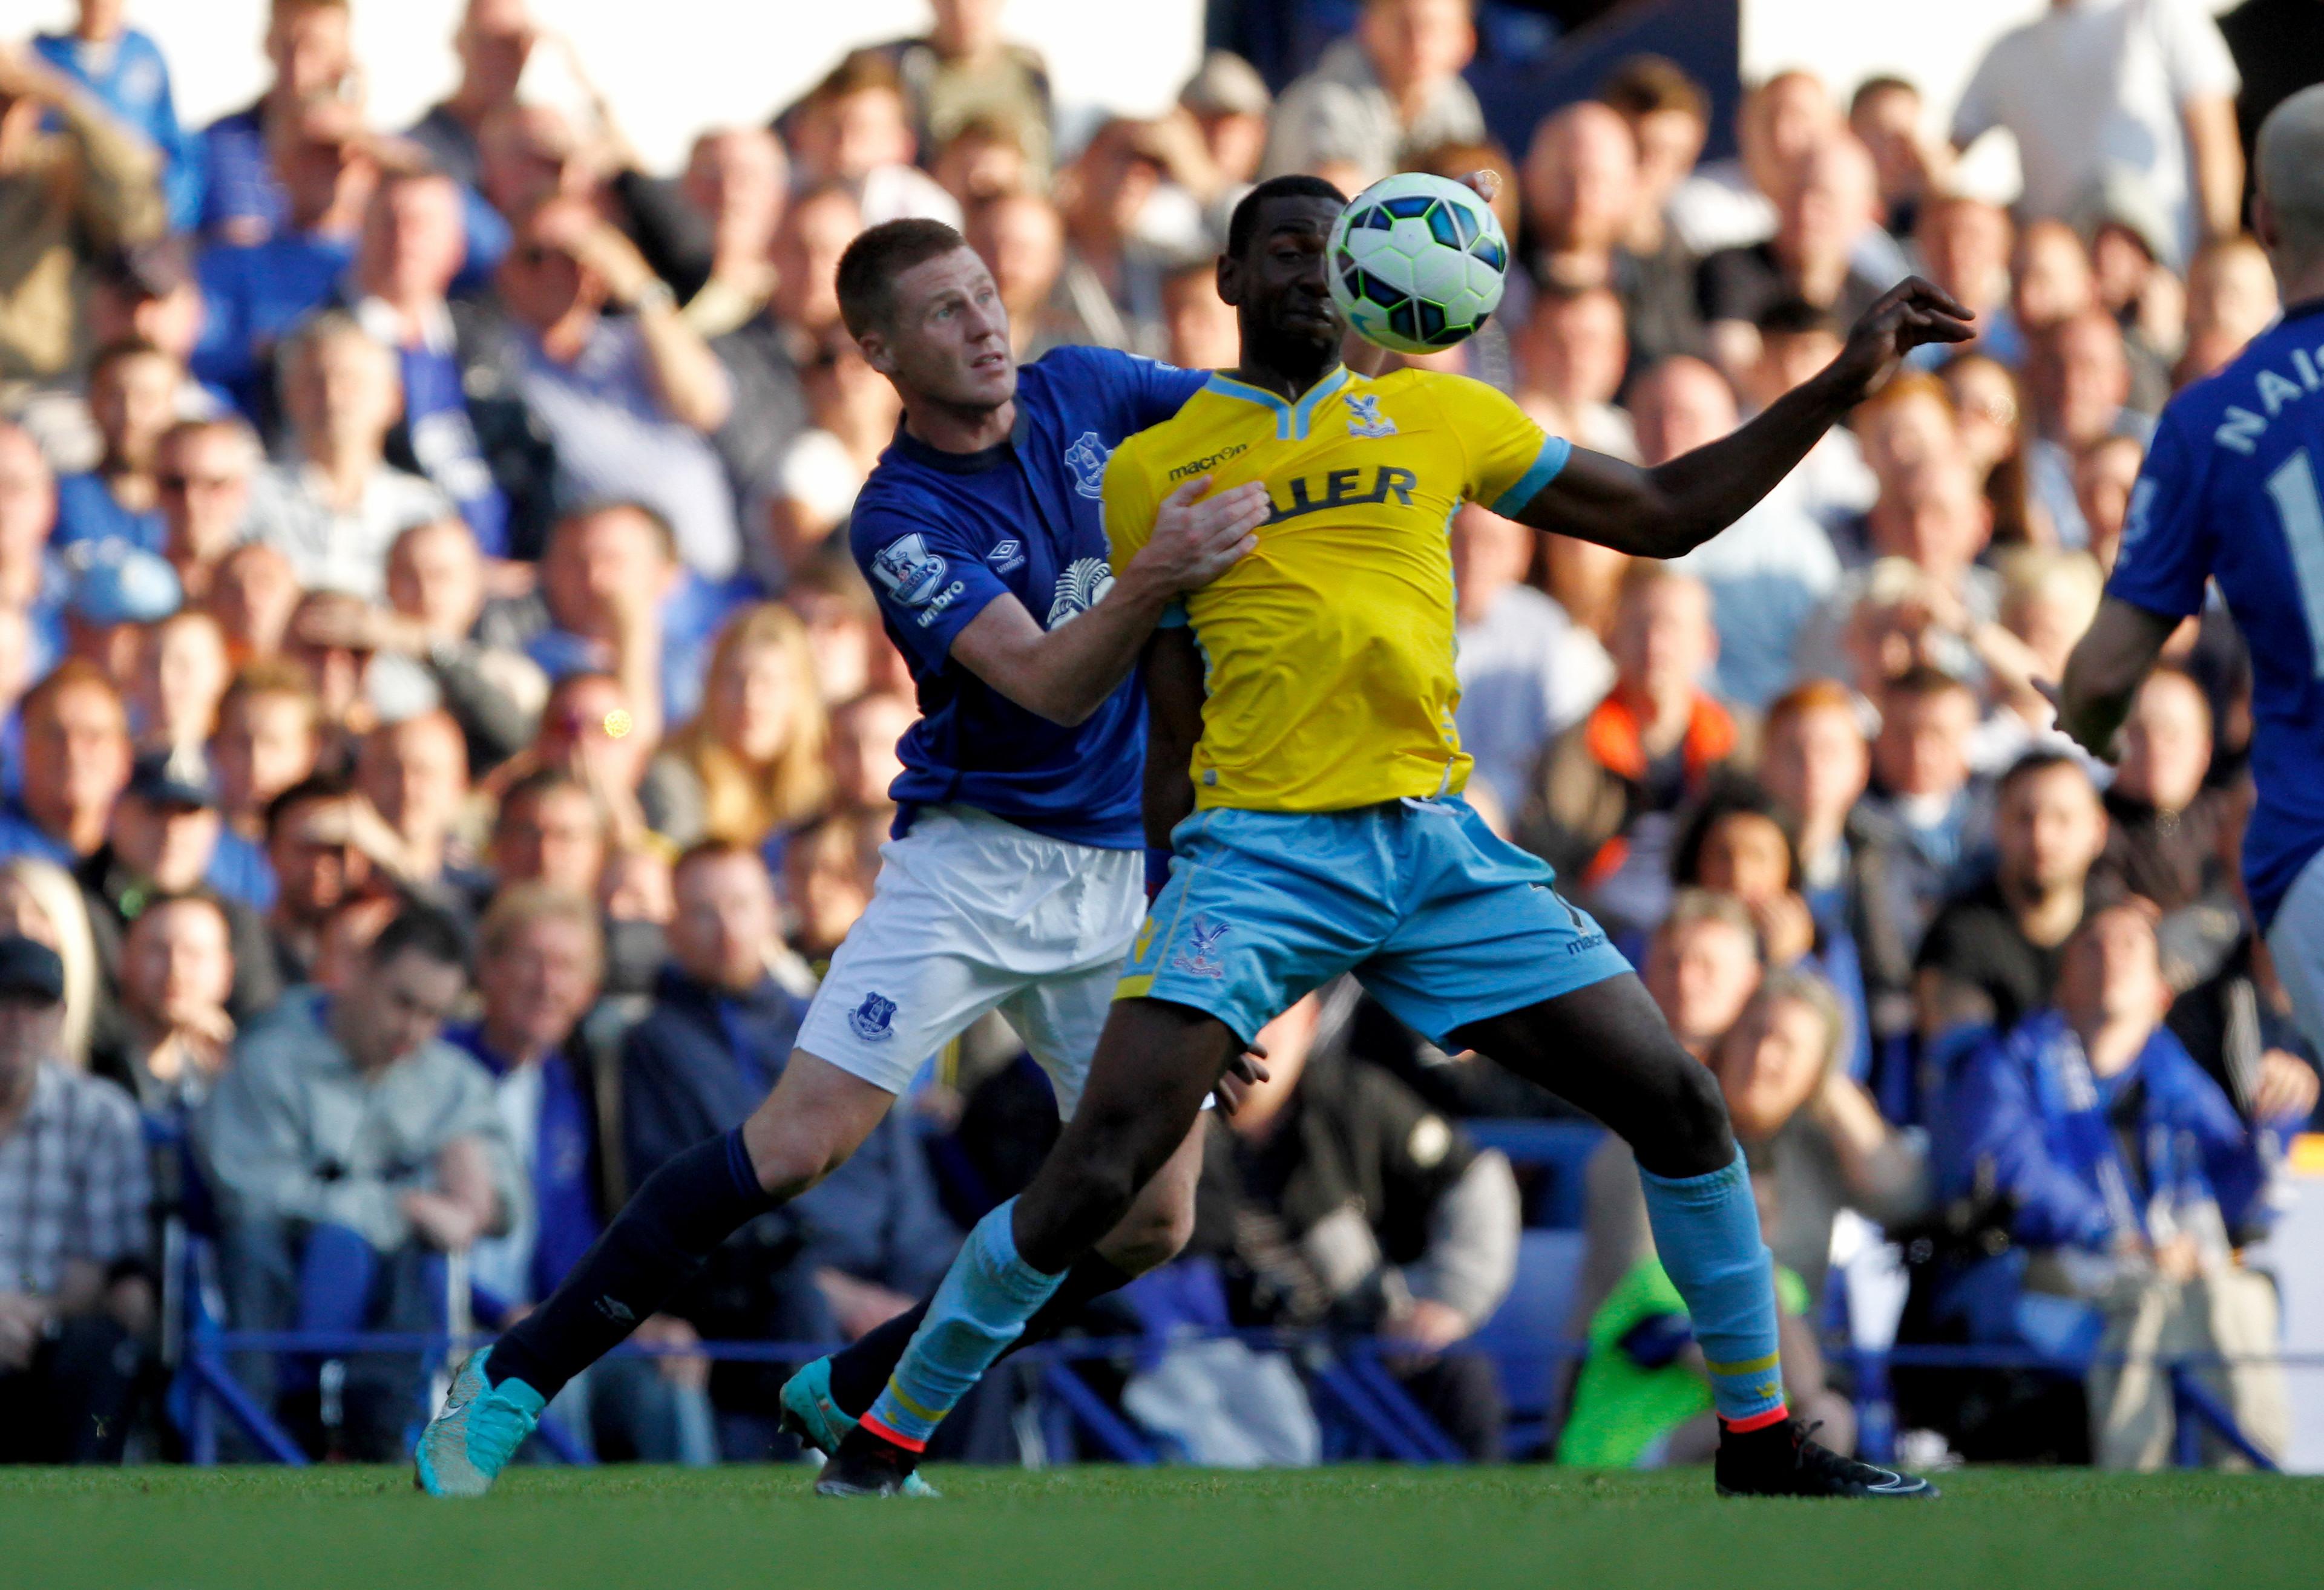 New Newcastle manager targeting Everton fringe players